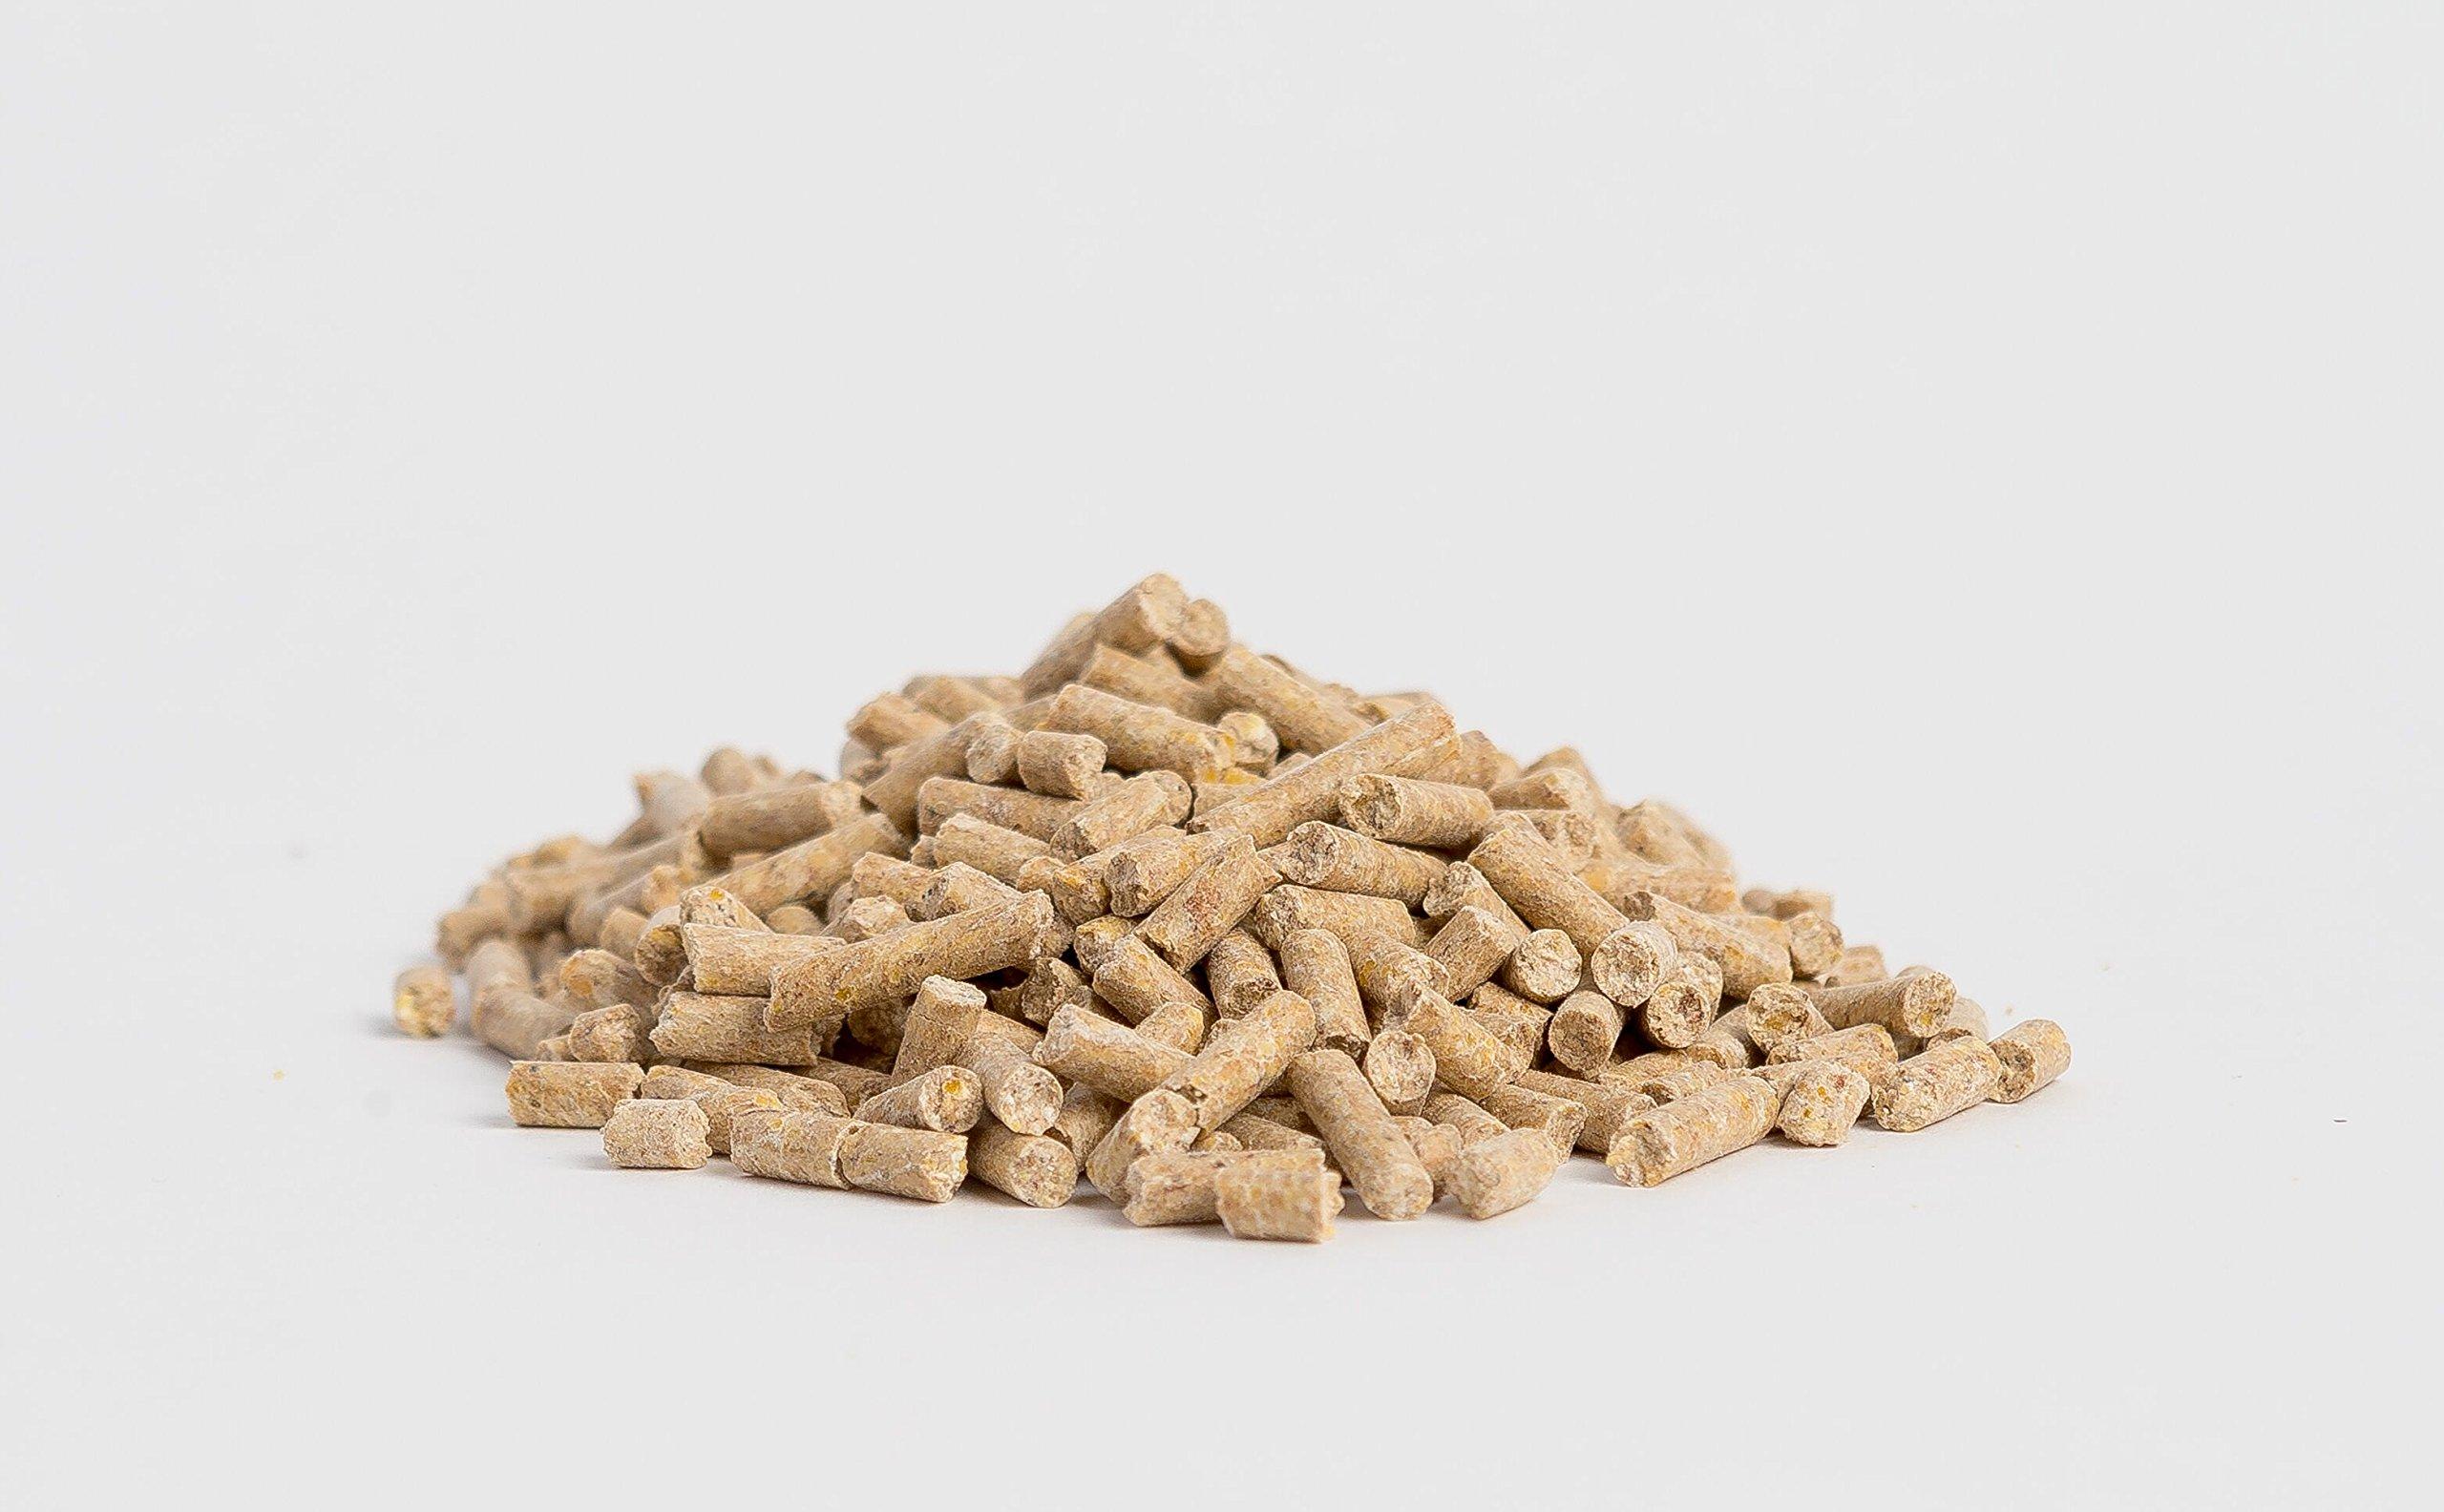 Horse Guard Mega Dose Equine Vitamin Mineral Hoof & Probiotic Supplement, 40 lb by Horse Guard (Image #4)